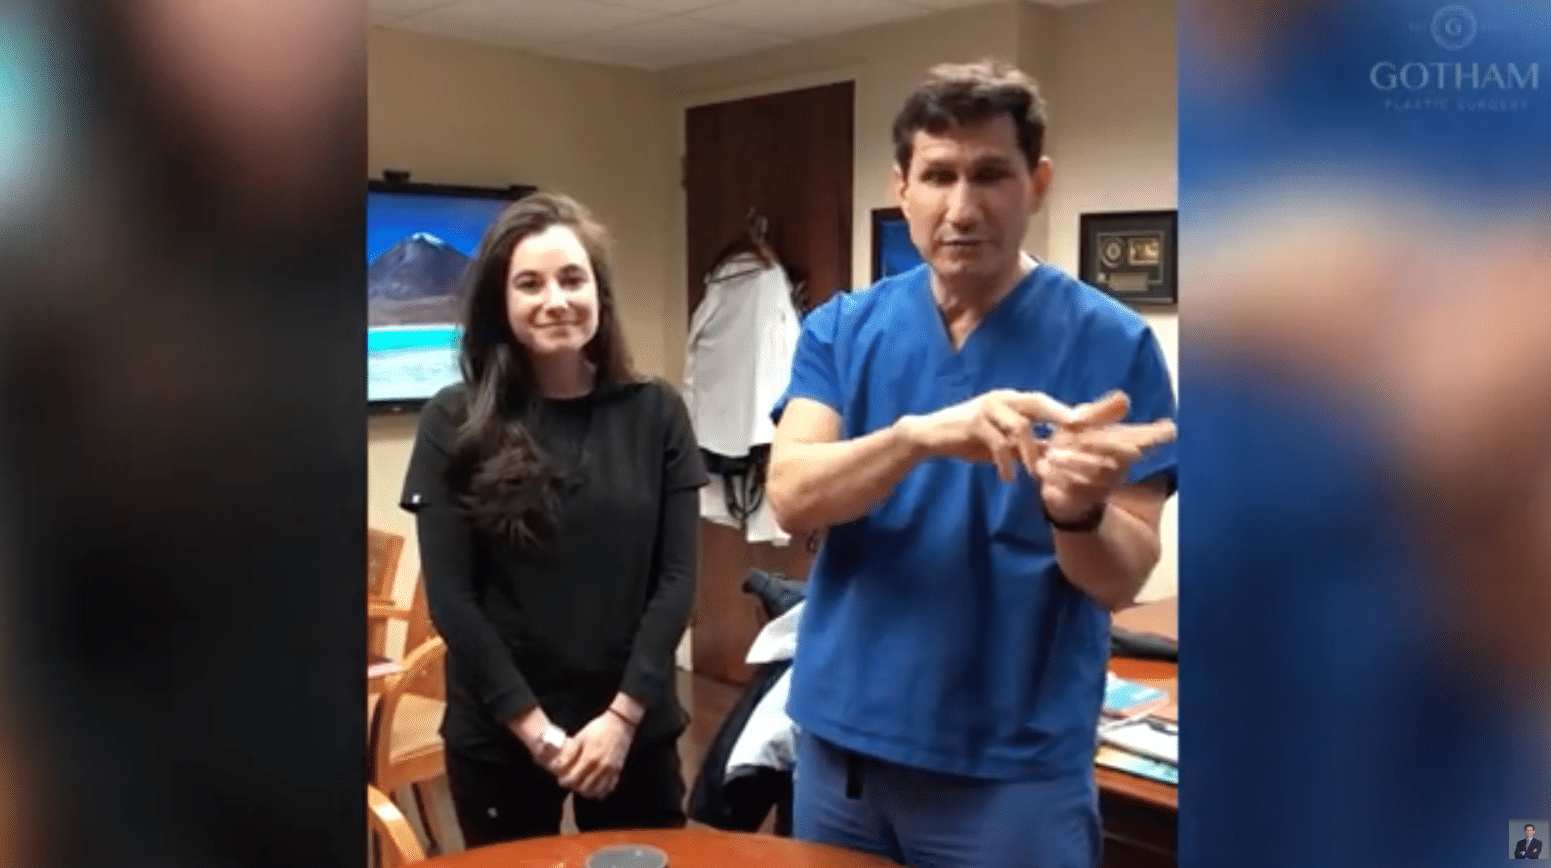 Meet Gotham's New Physician Assistant, Marissa!